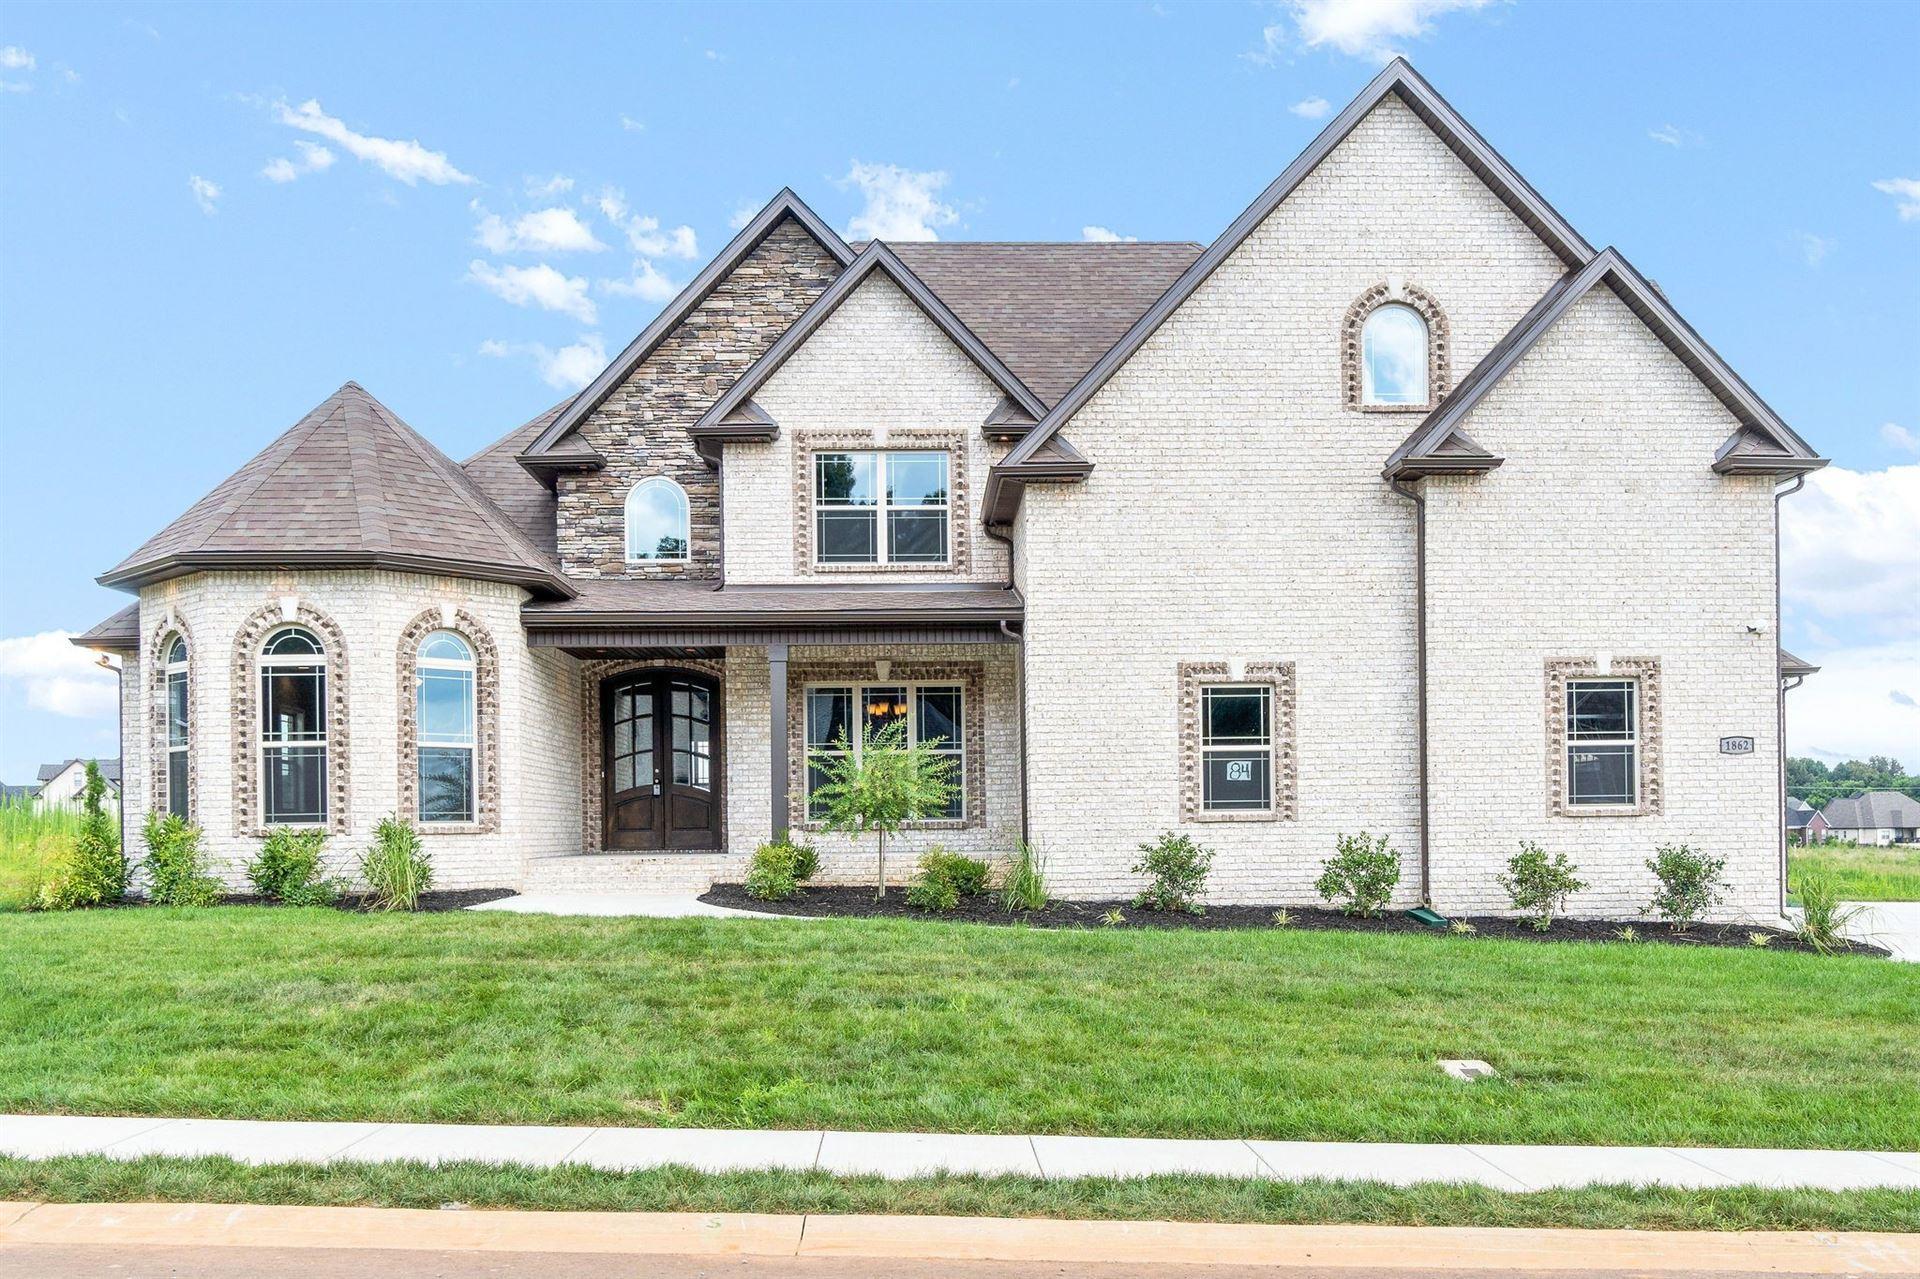 85 Hartley Hills, Clarksville, TN 37043 - MLS#: 2184227